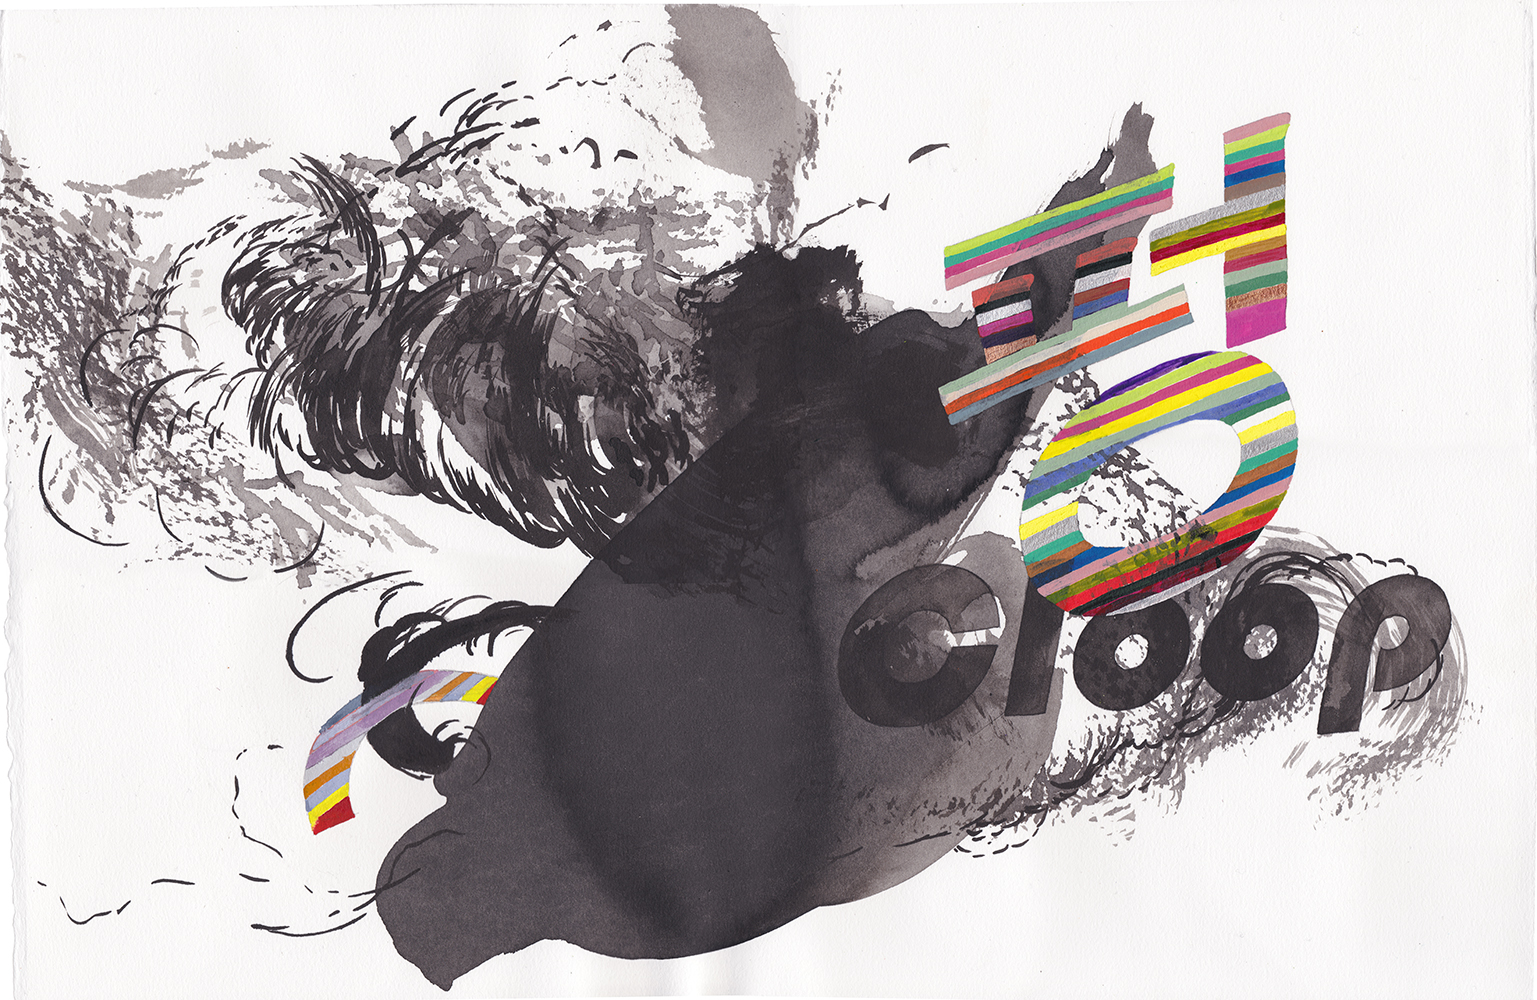 Cloop , 2018 Ink watercolor on paper, 57 x 37.5 cm